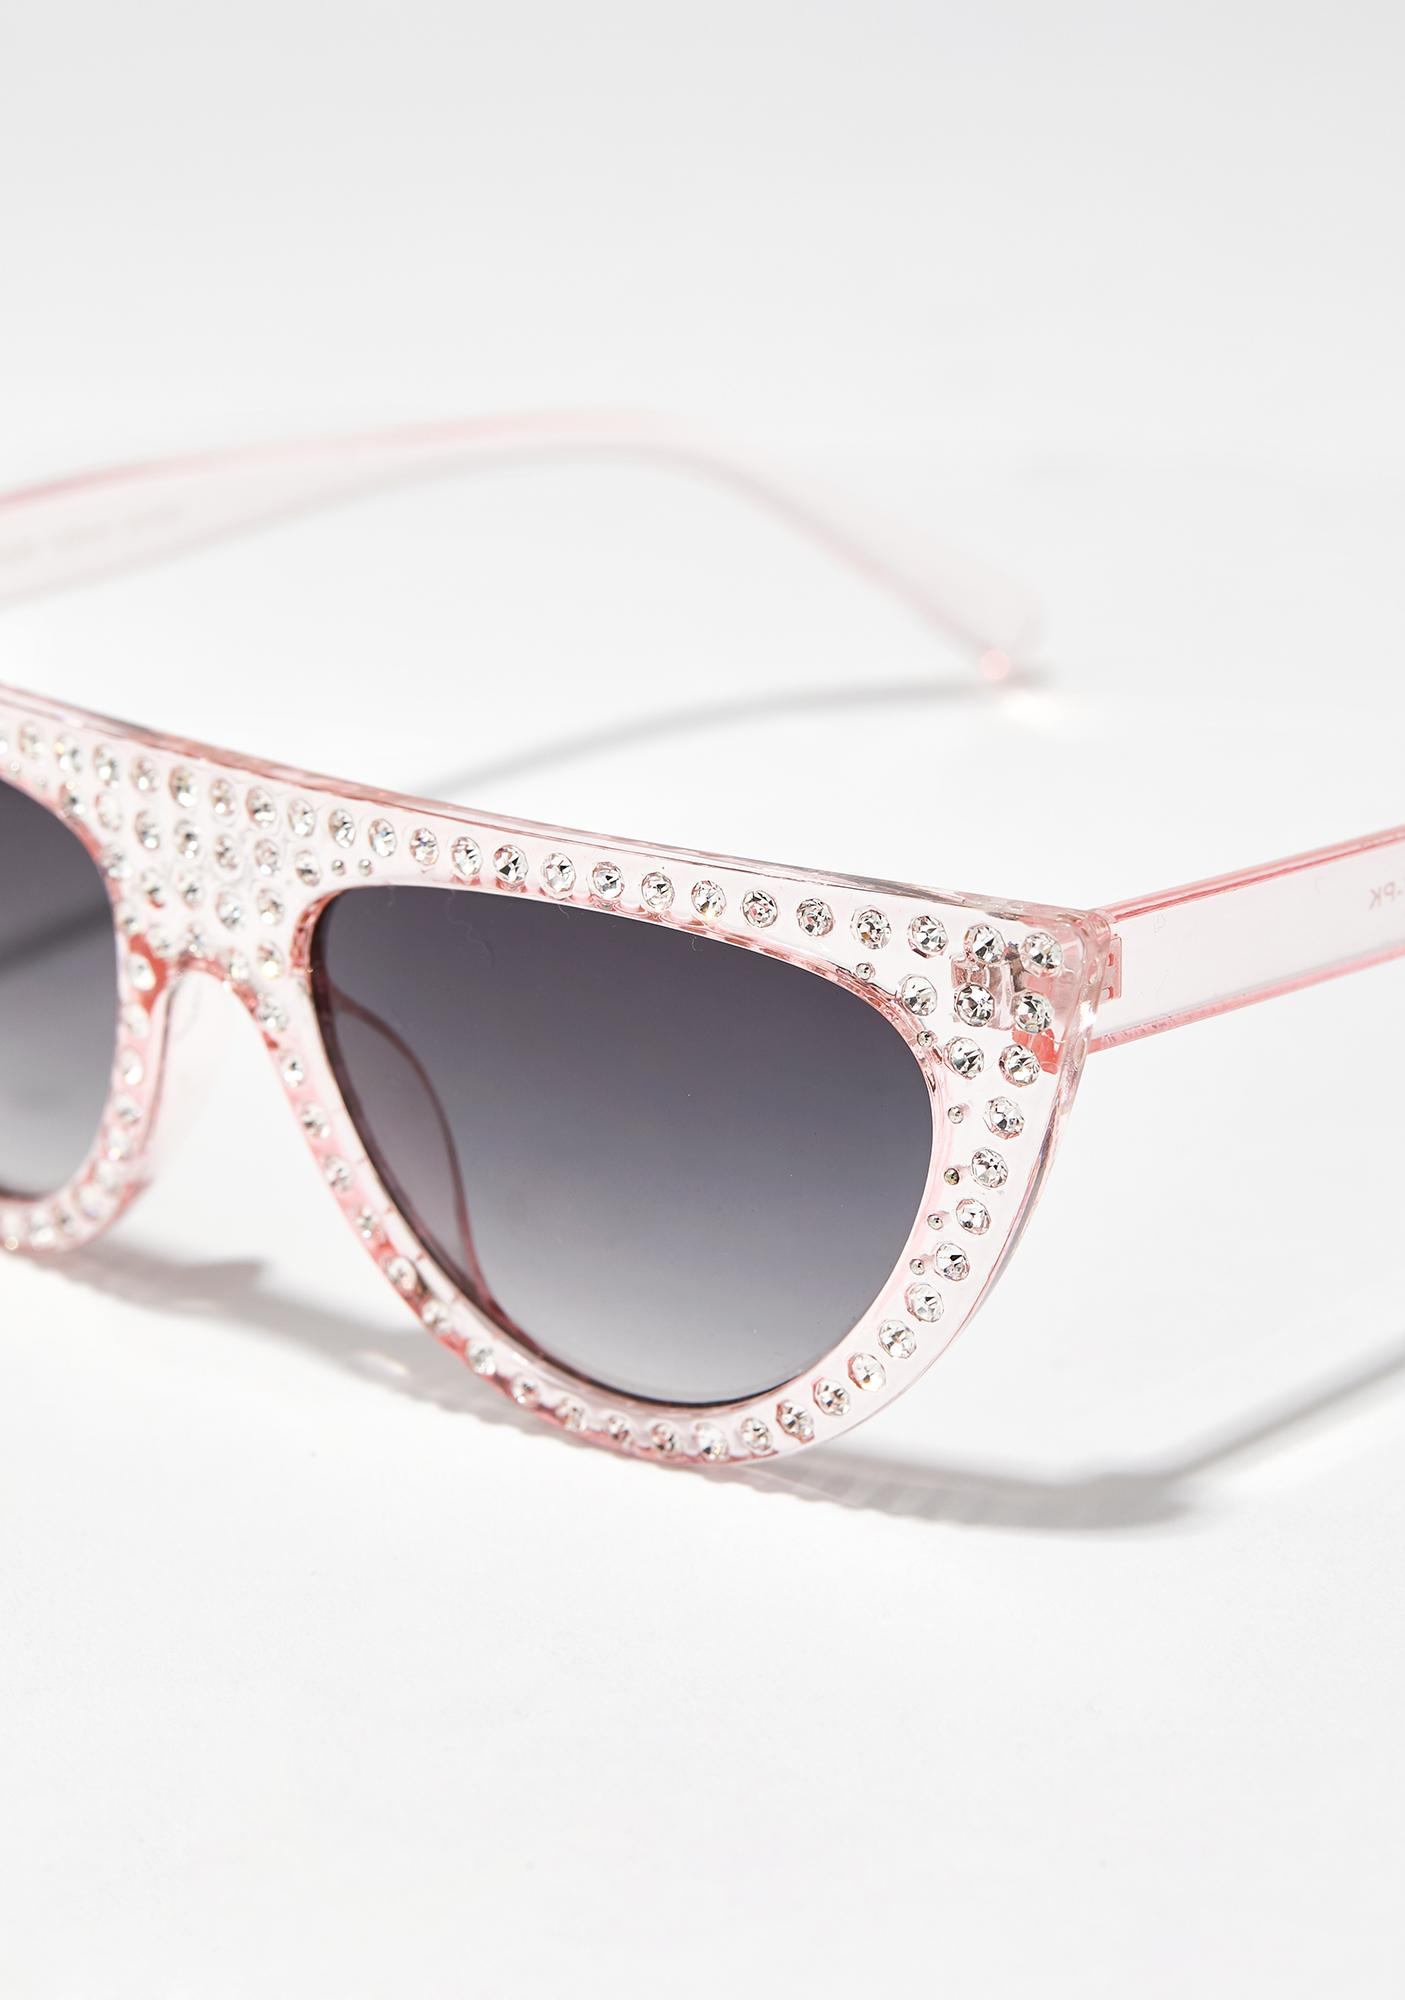 Blush Cold Frost Jeweled Sunglasses